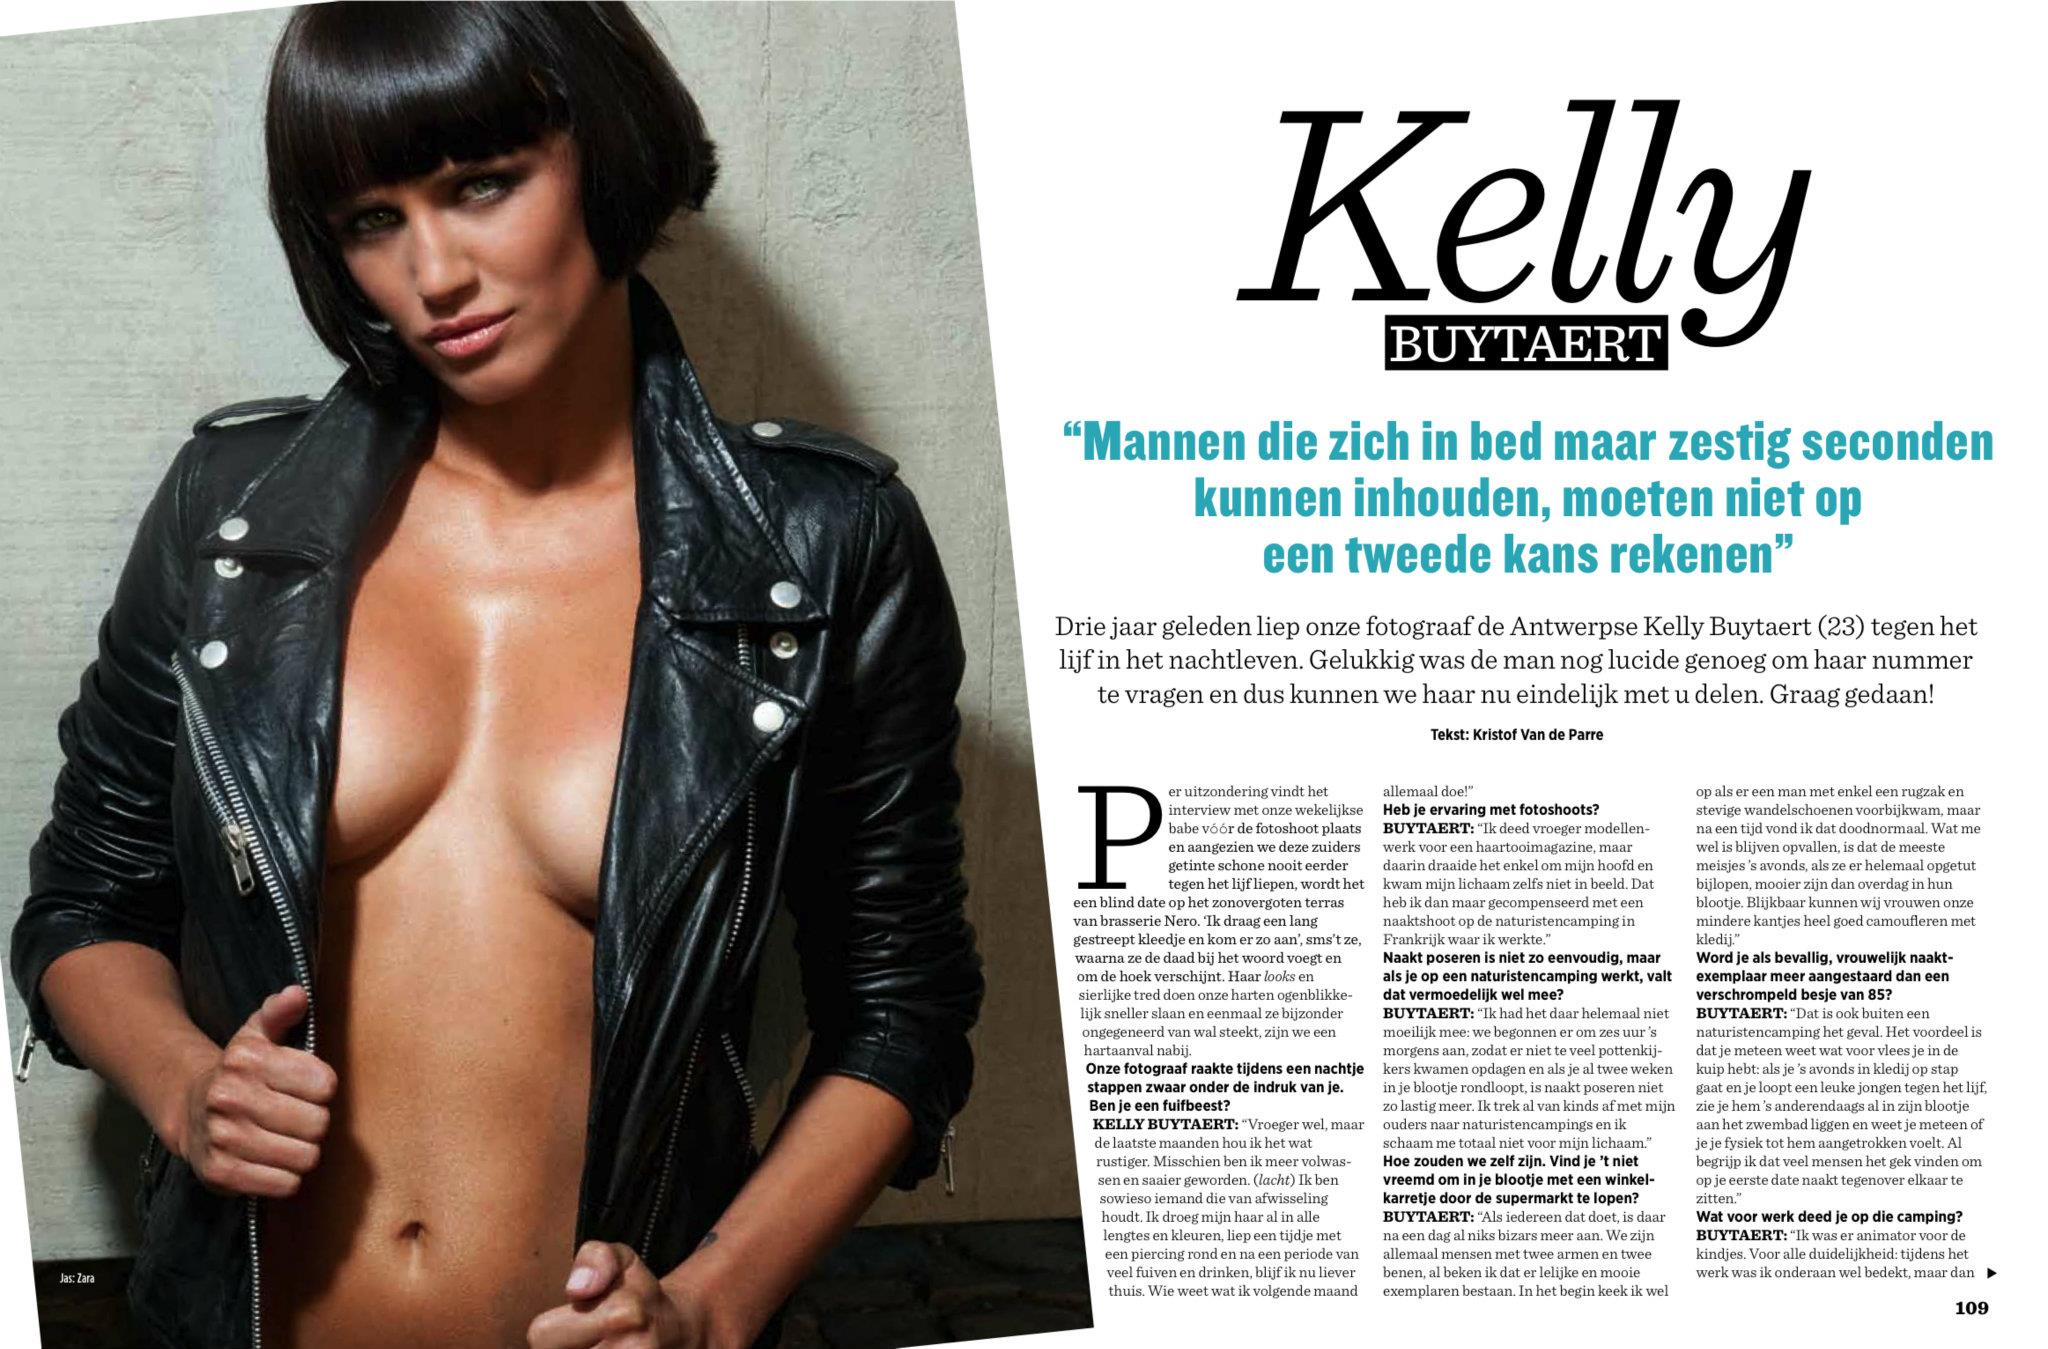 bart albrecht fotograaf photographer belgium p magazine che playboy editorial magazines glamour boudoir daniela degraux kelly buytaert 0006.jpg